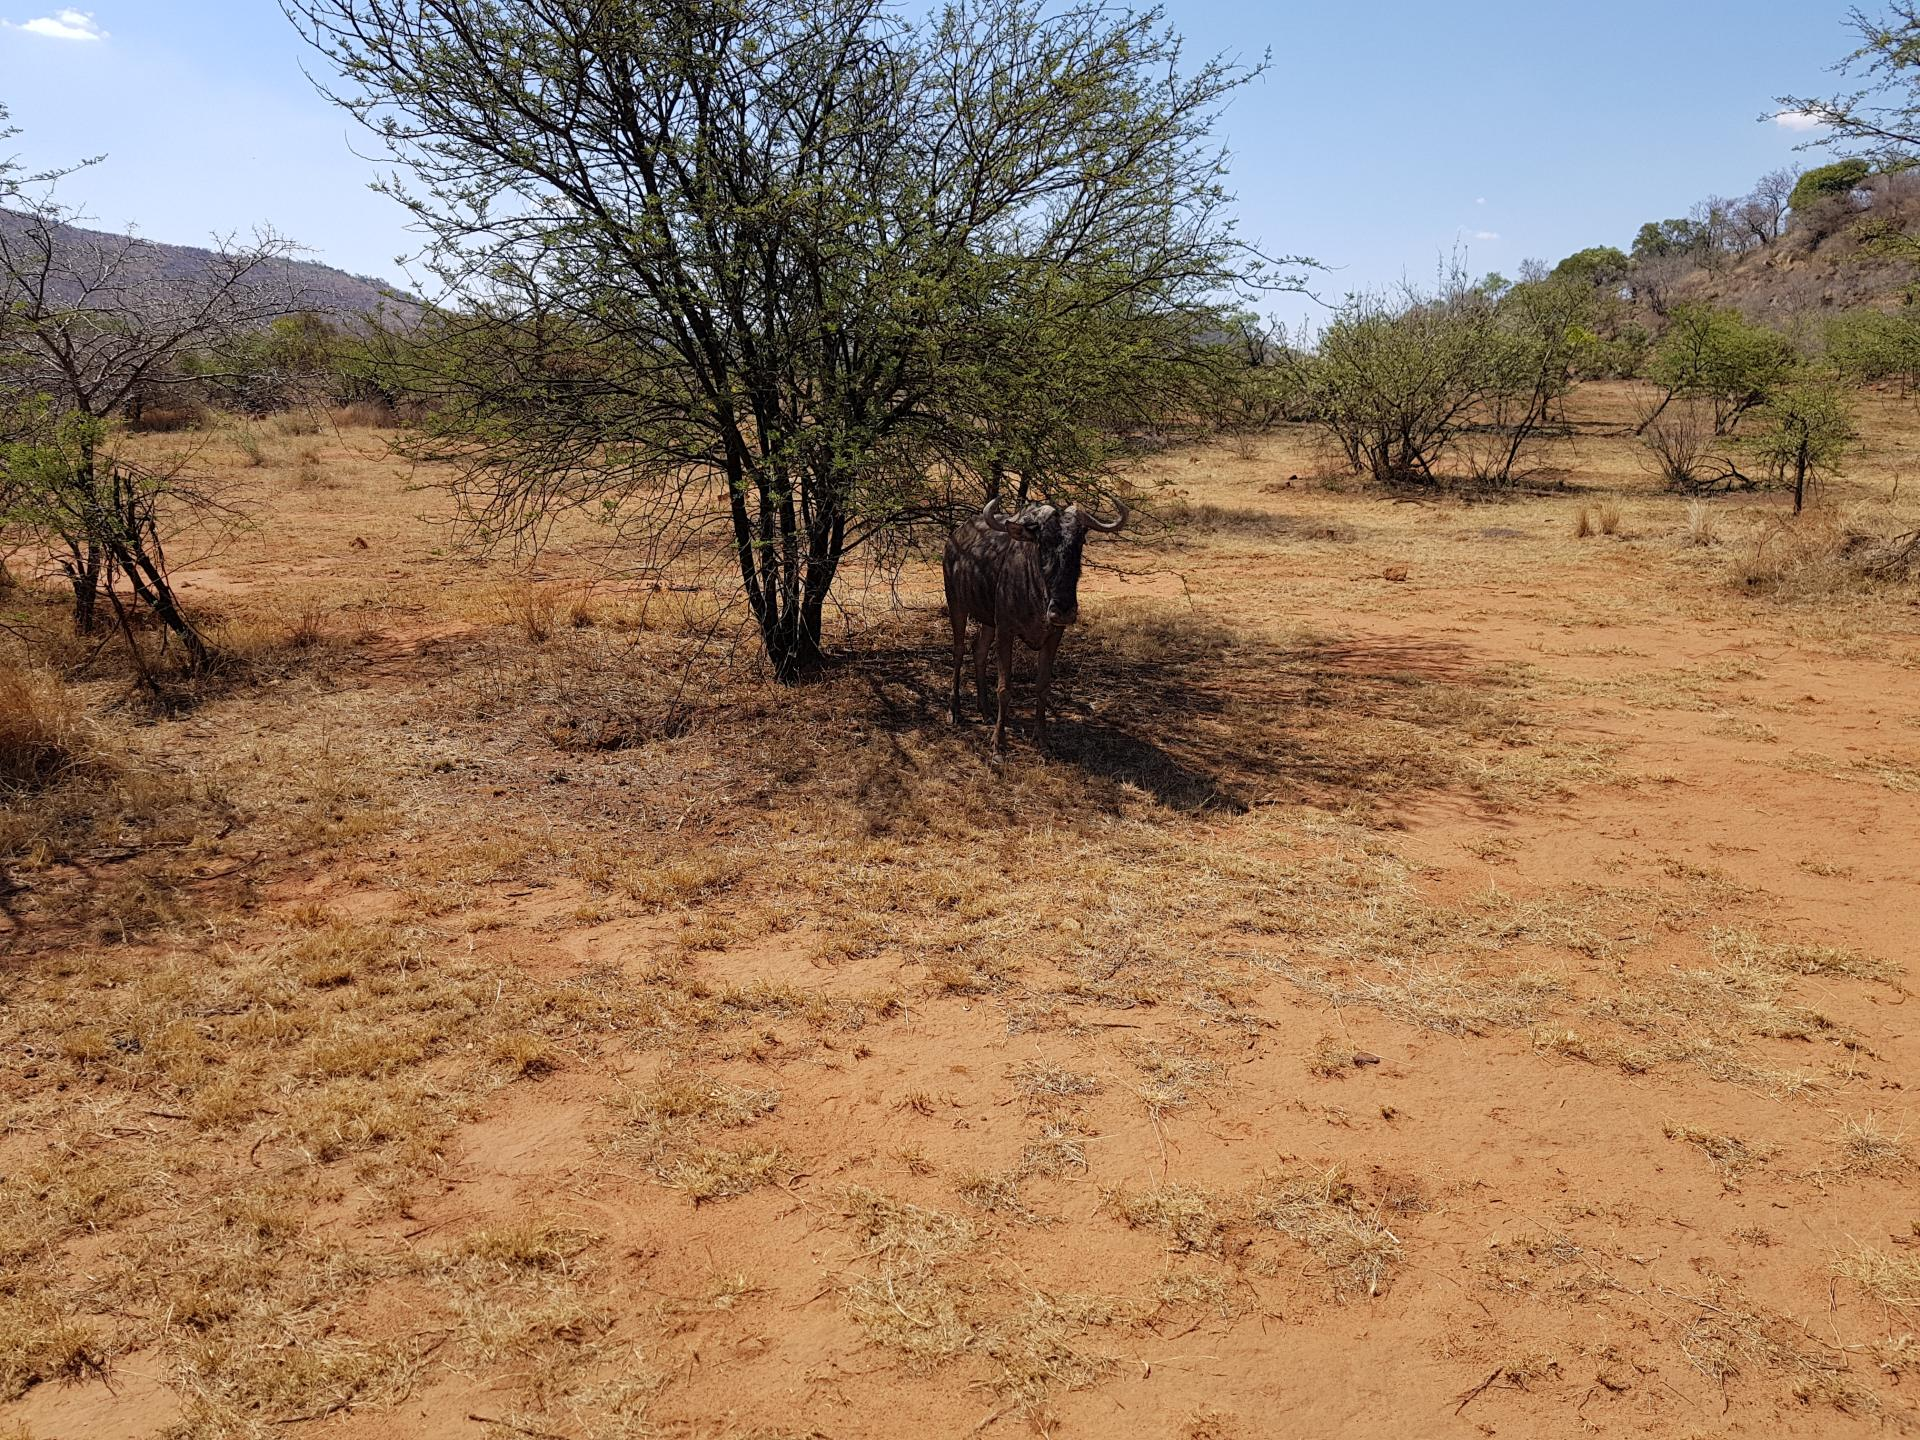 антилопа Гну, парк Пиланесберг